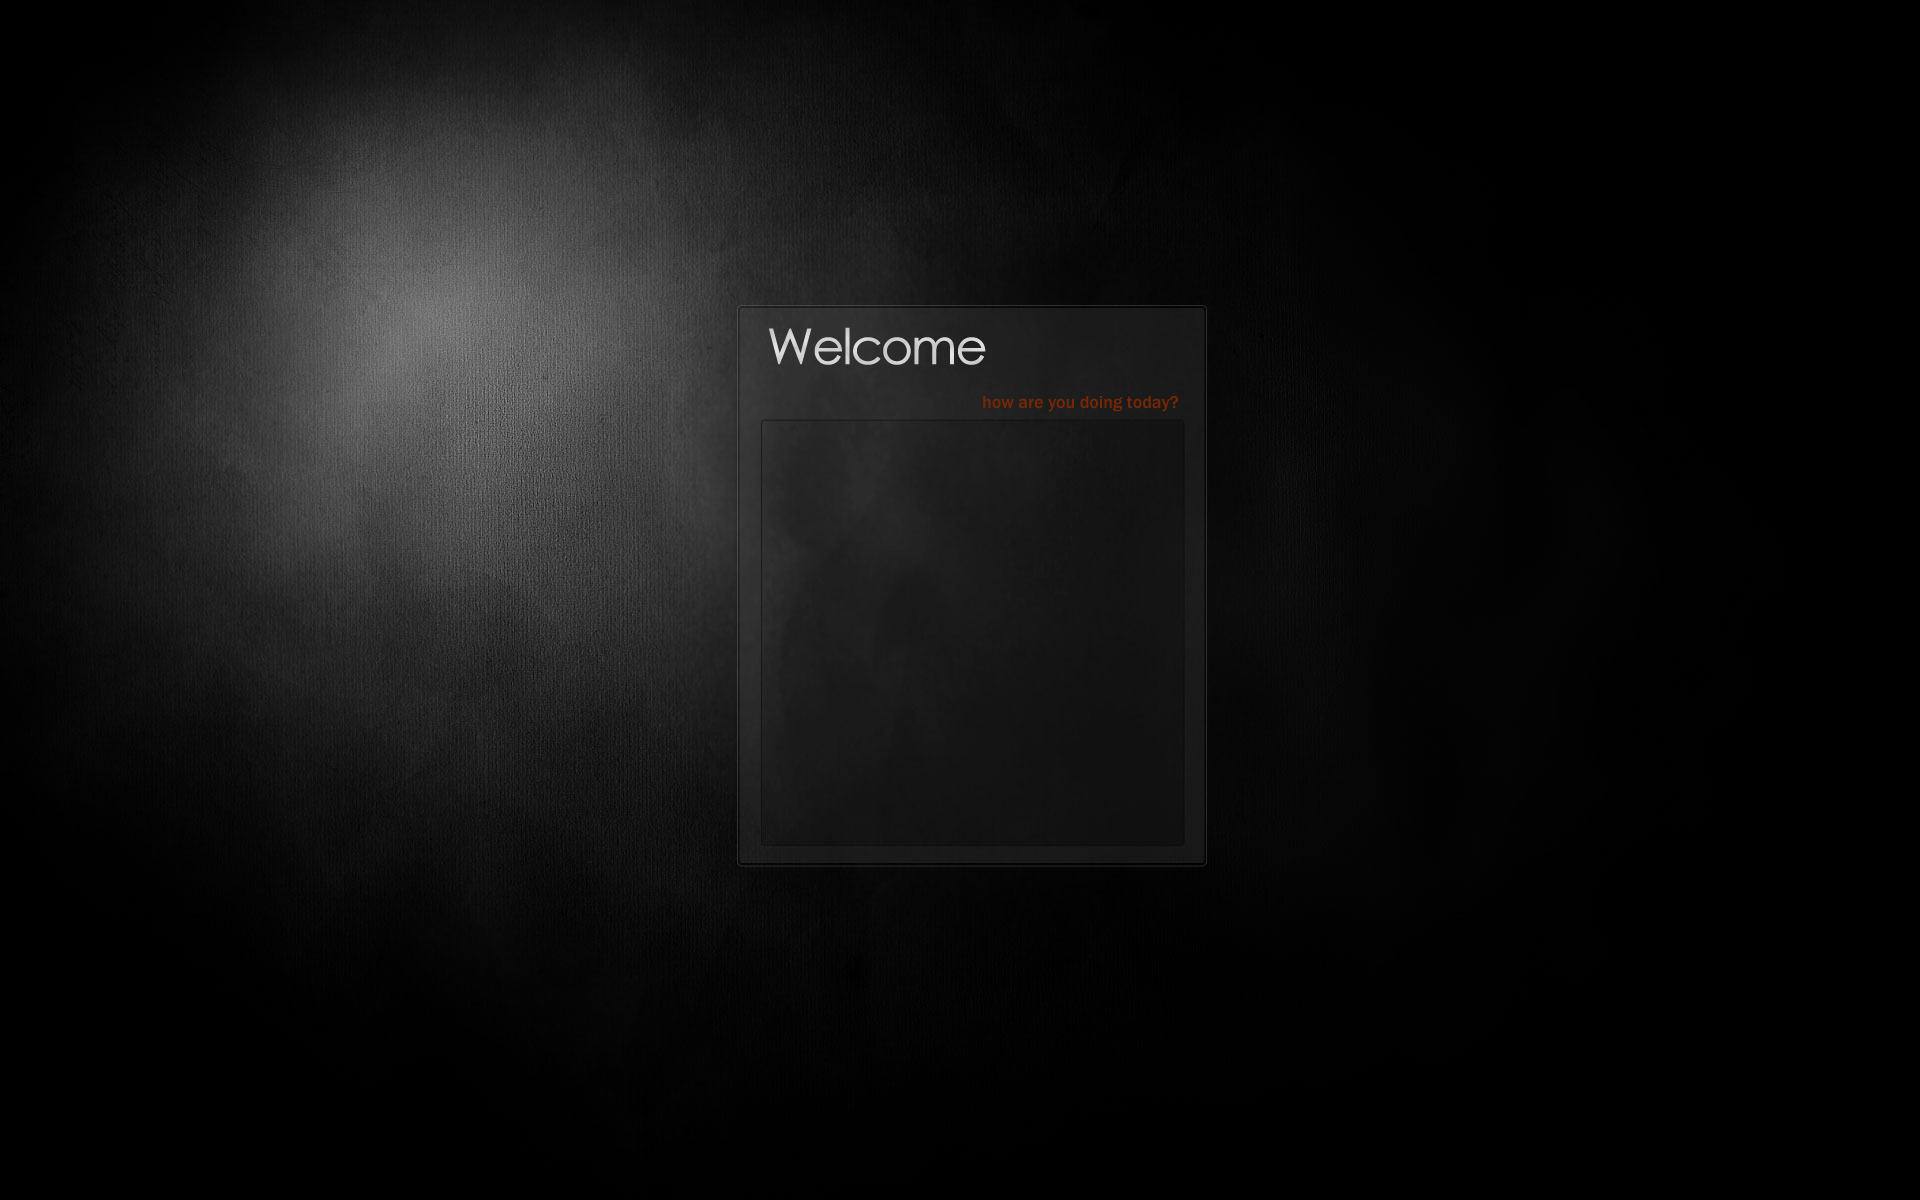 Windows 7 Logon Screen Background Download Download Marx Bros